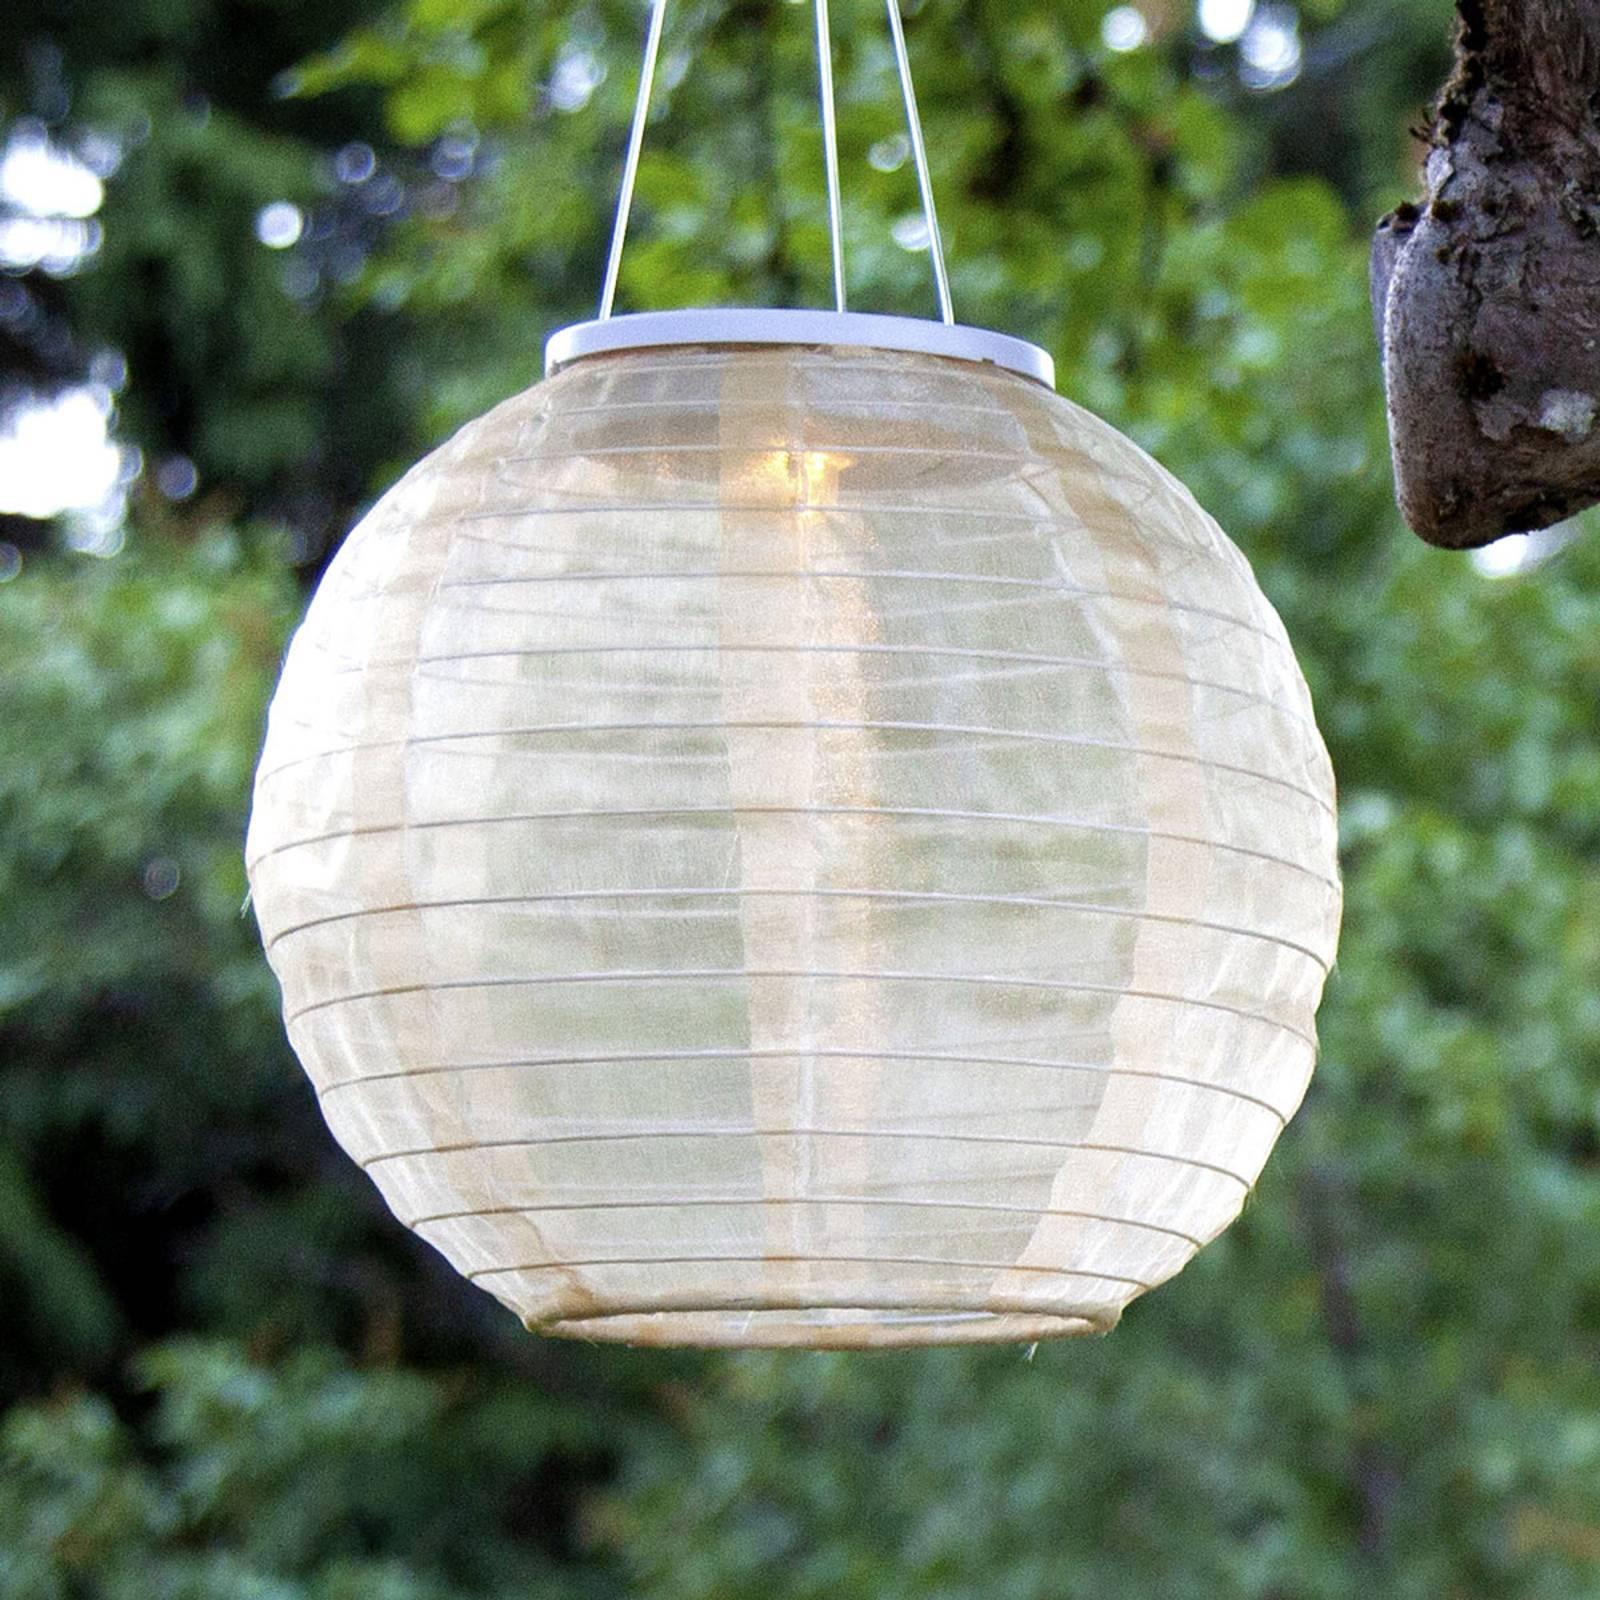 Aurinkokäyttöinen Festival-LED-valaisin, Ø 25 cm